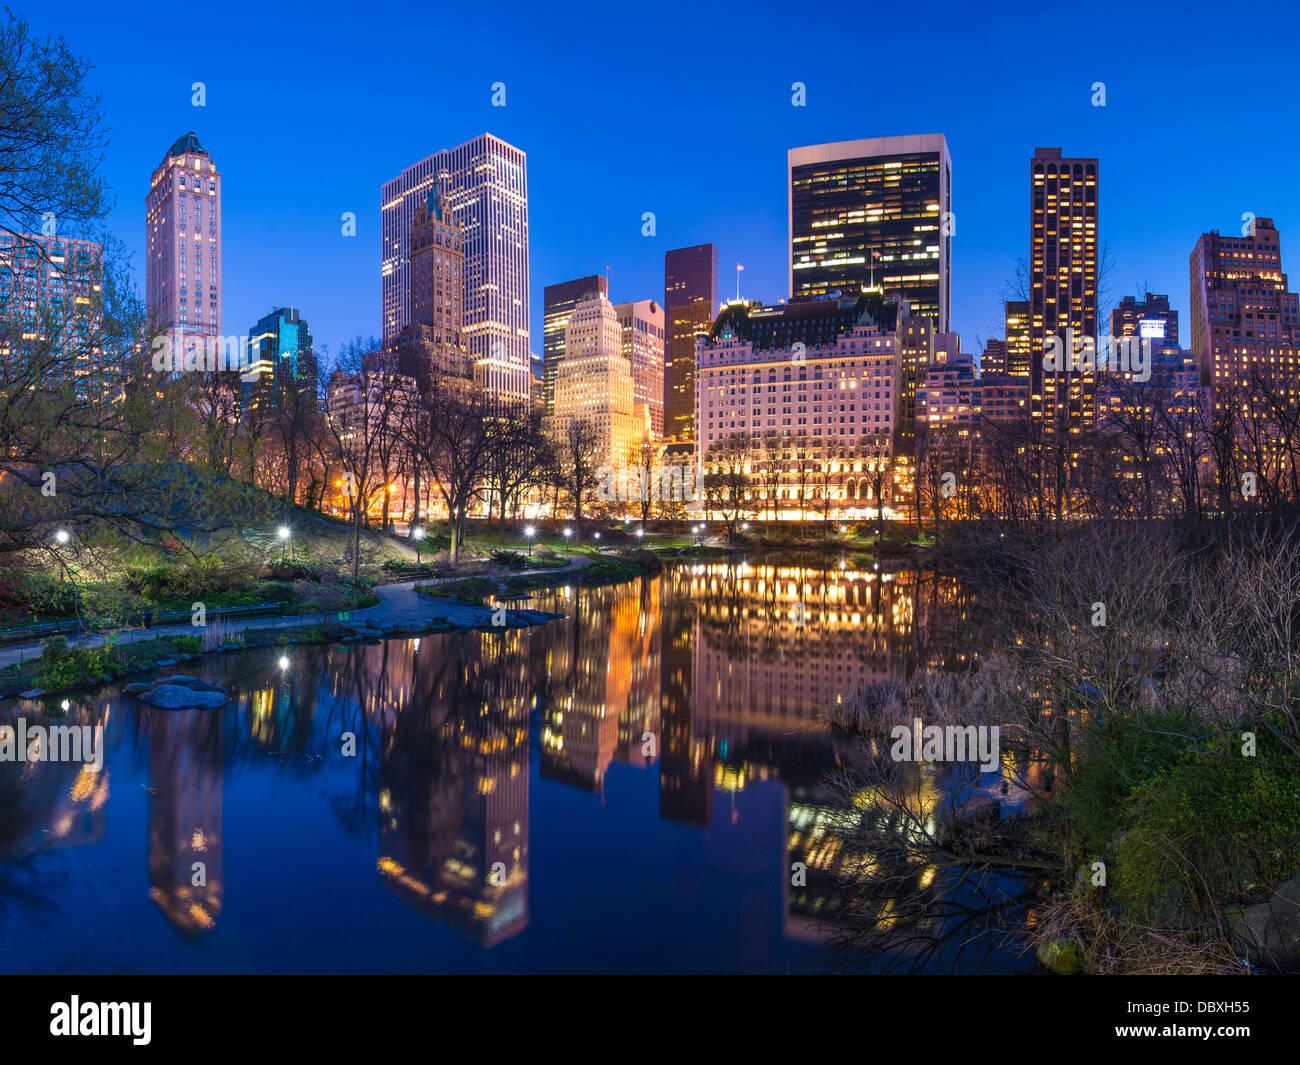 Skyline le long de Central Park South à New York City, USA. Photo Stock